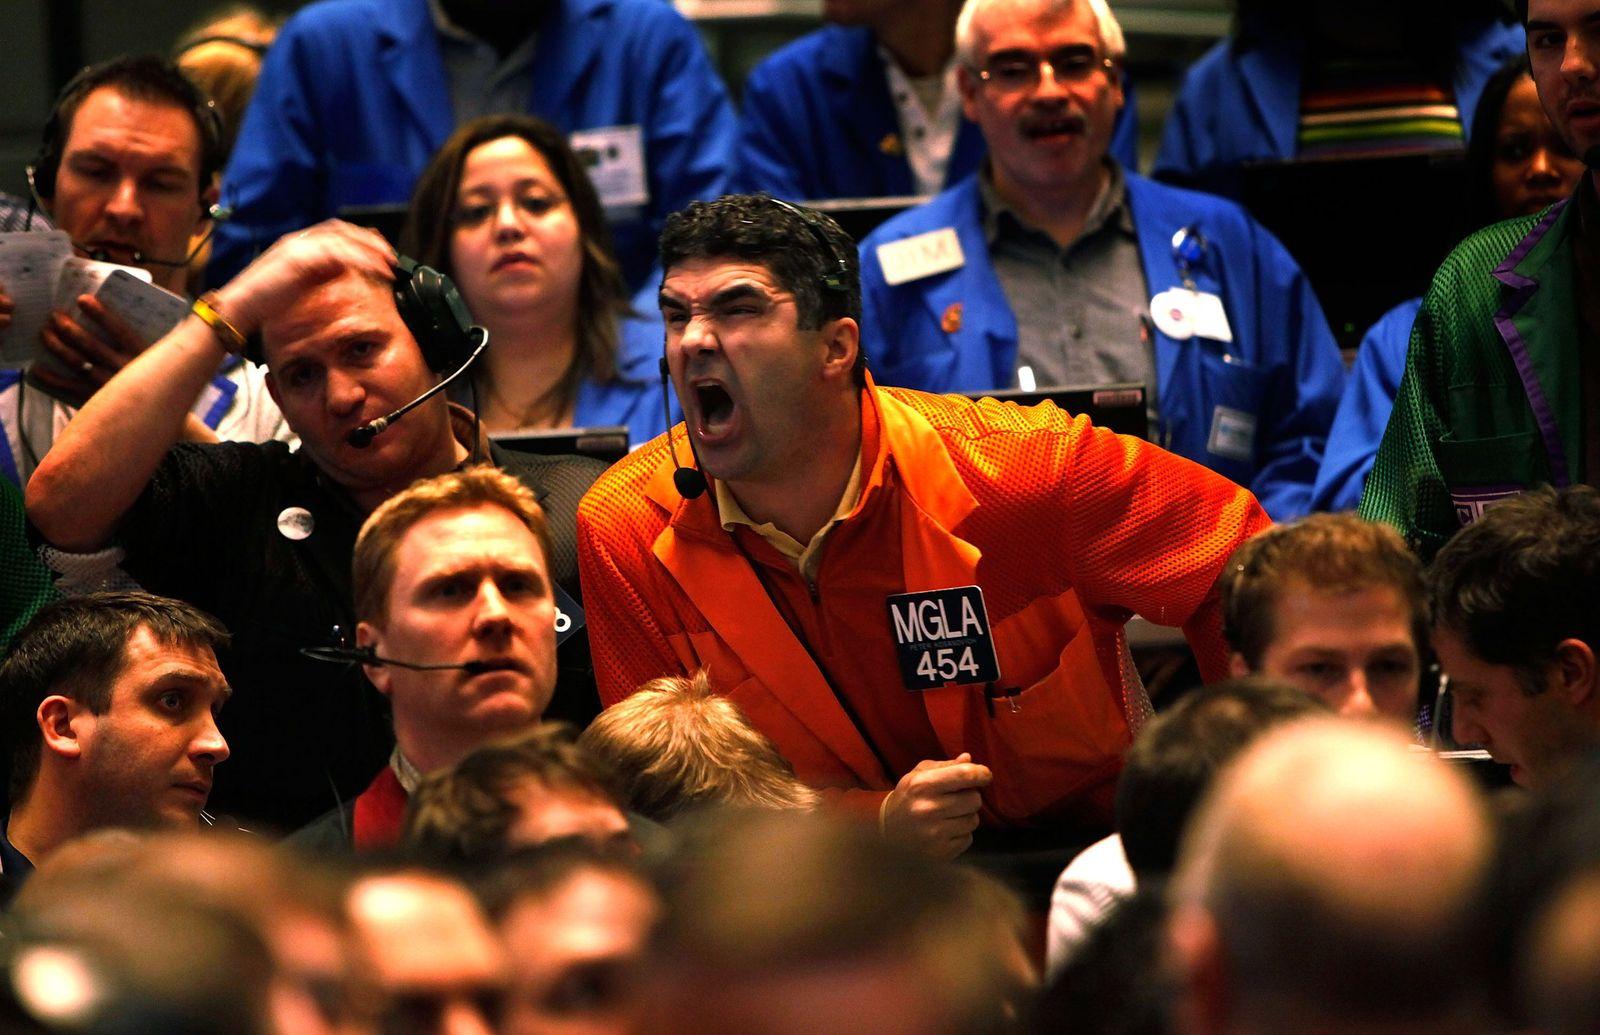 Wall Street / Finanzmarkt / Krise